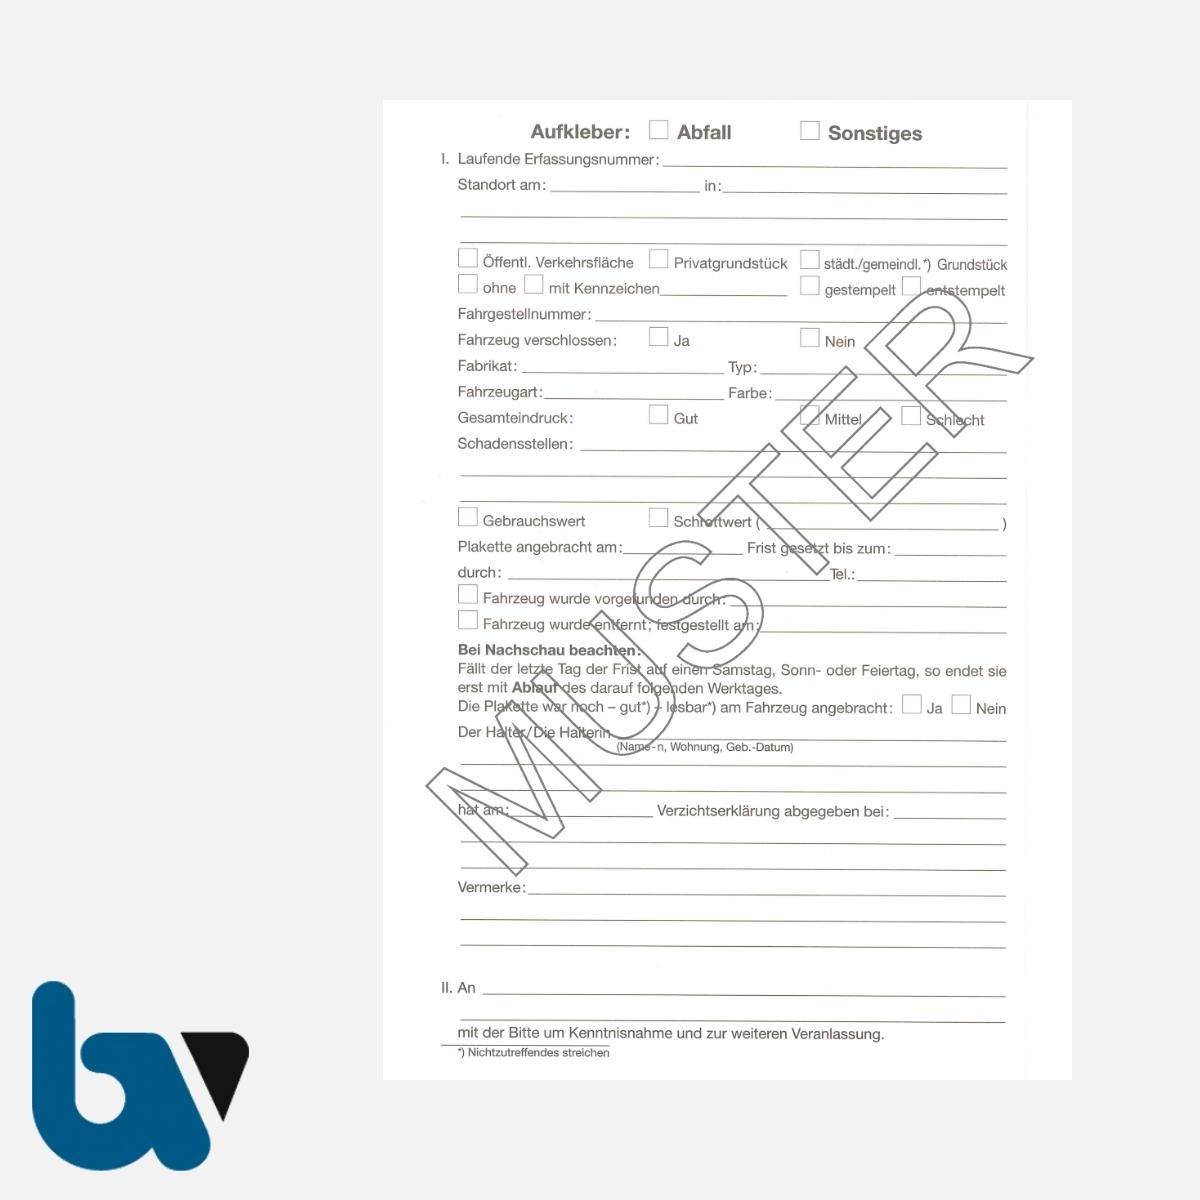 0/442-10 Aufkleber Aufforderung Entfernung Fahrzeug selbstklebend Straßenverkehrsordnung StVO Kreislaufwirtschaft KrWG Aufnahmeprotokoll Abfall DIN A5 RS | Borgard Verlag GmbH